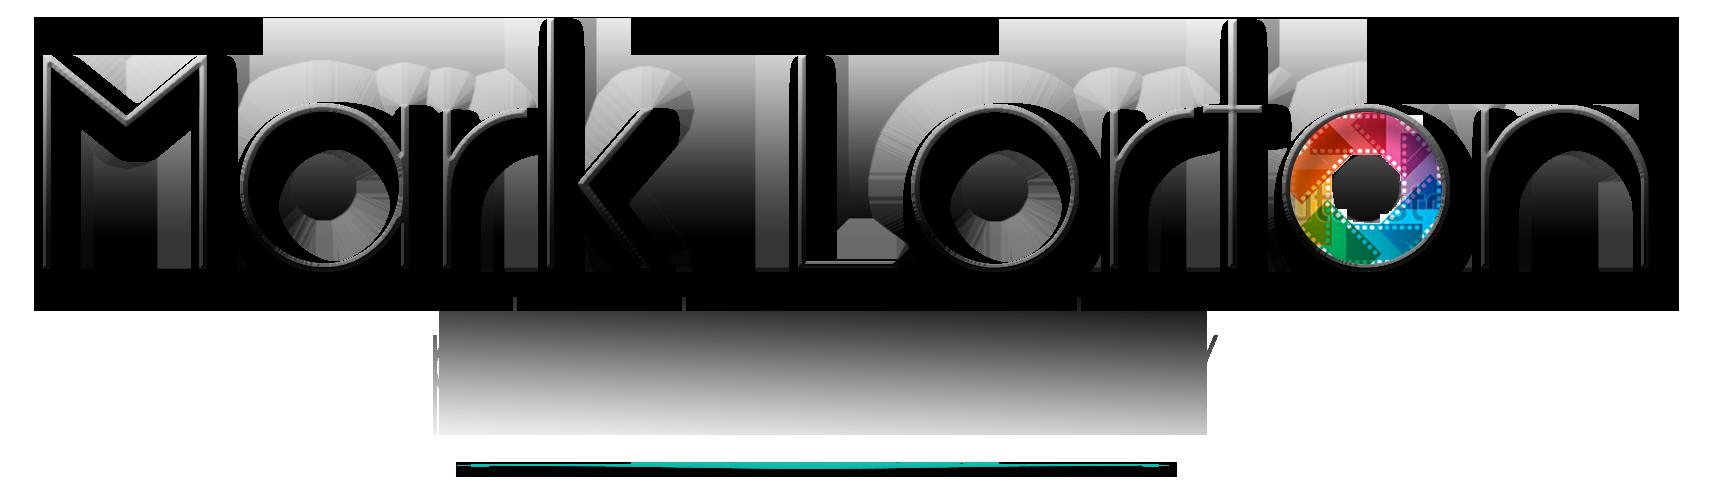 marklortonphotography